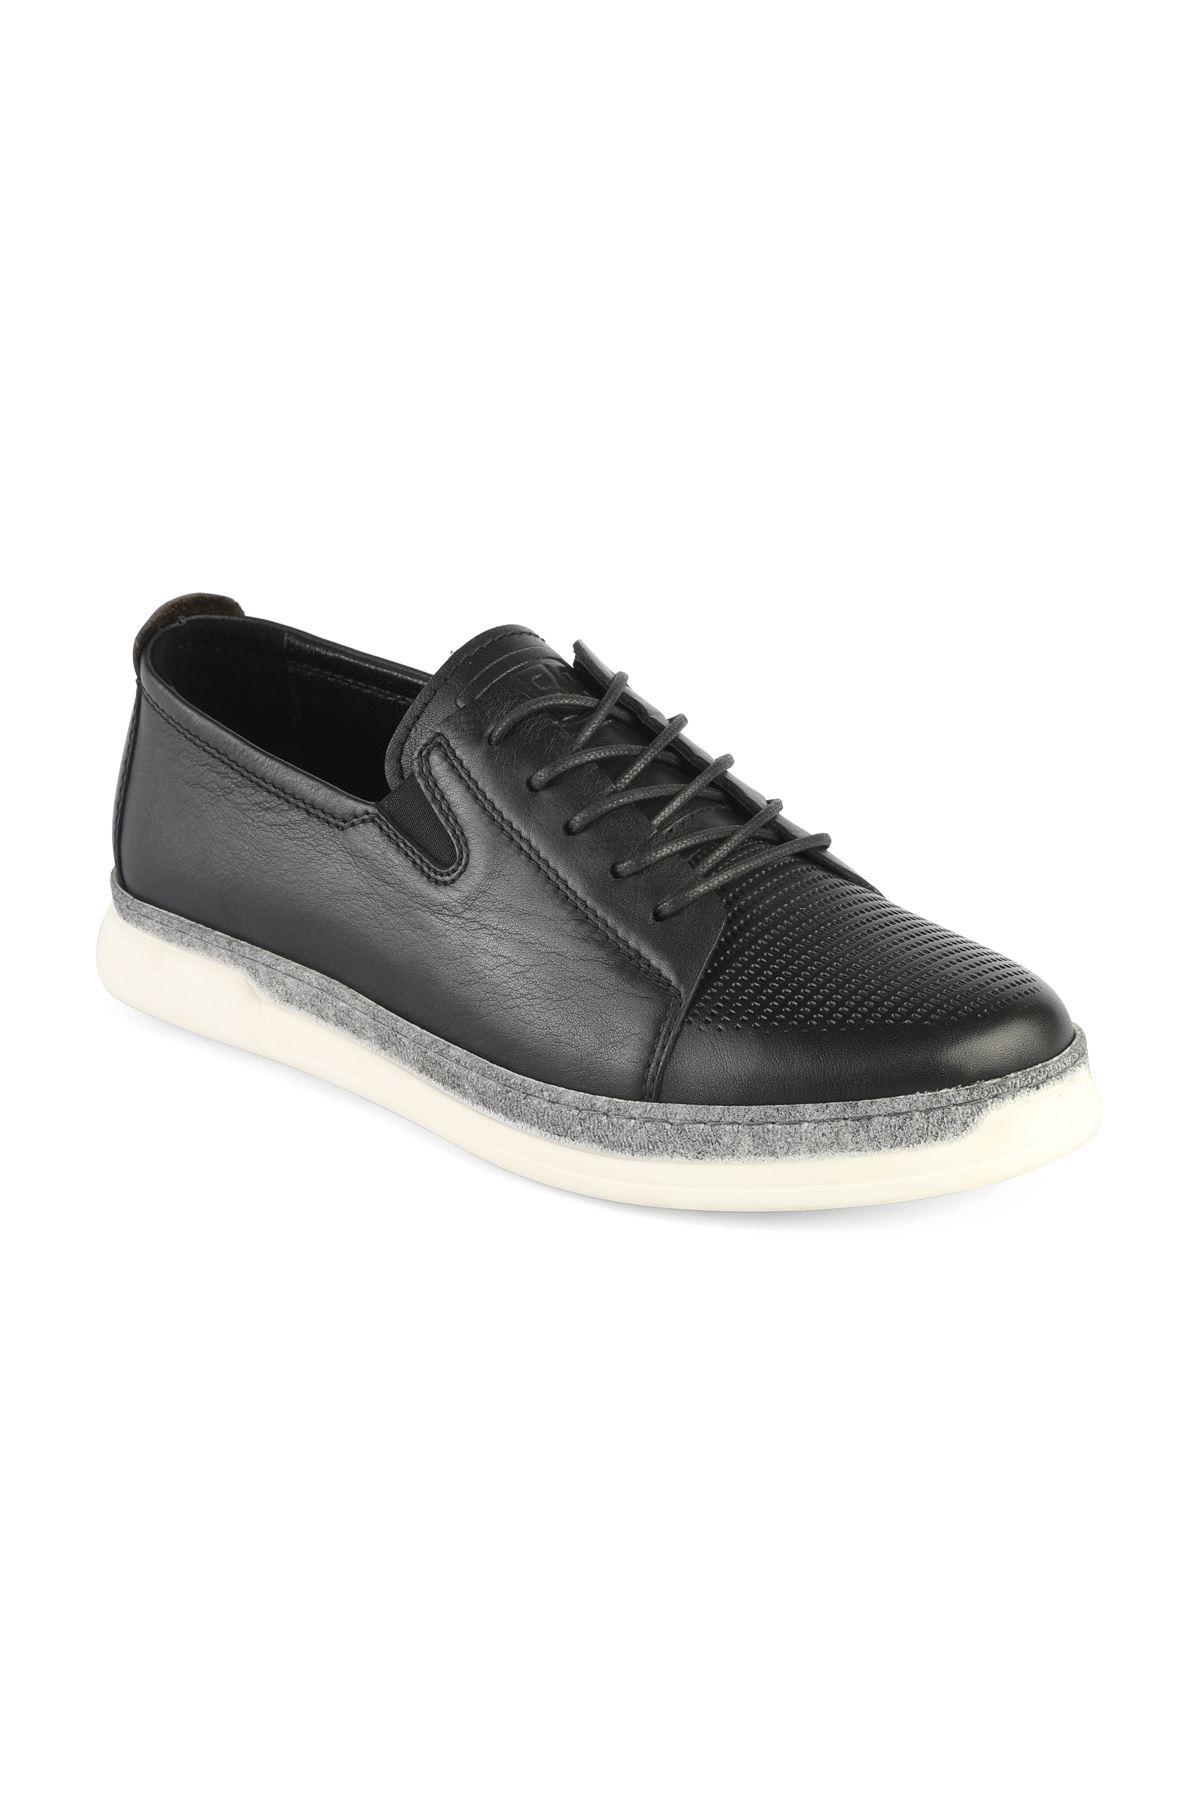 Libero 3307 Black Loafer Shoes